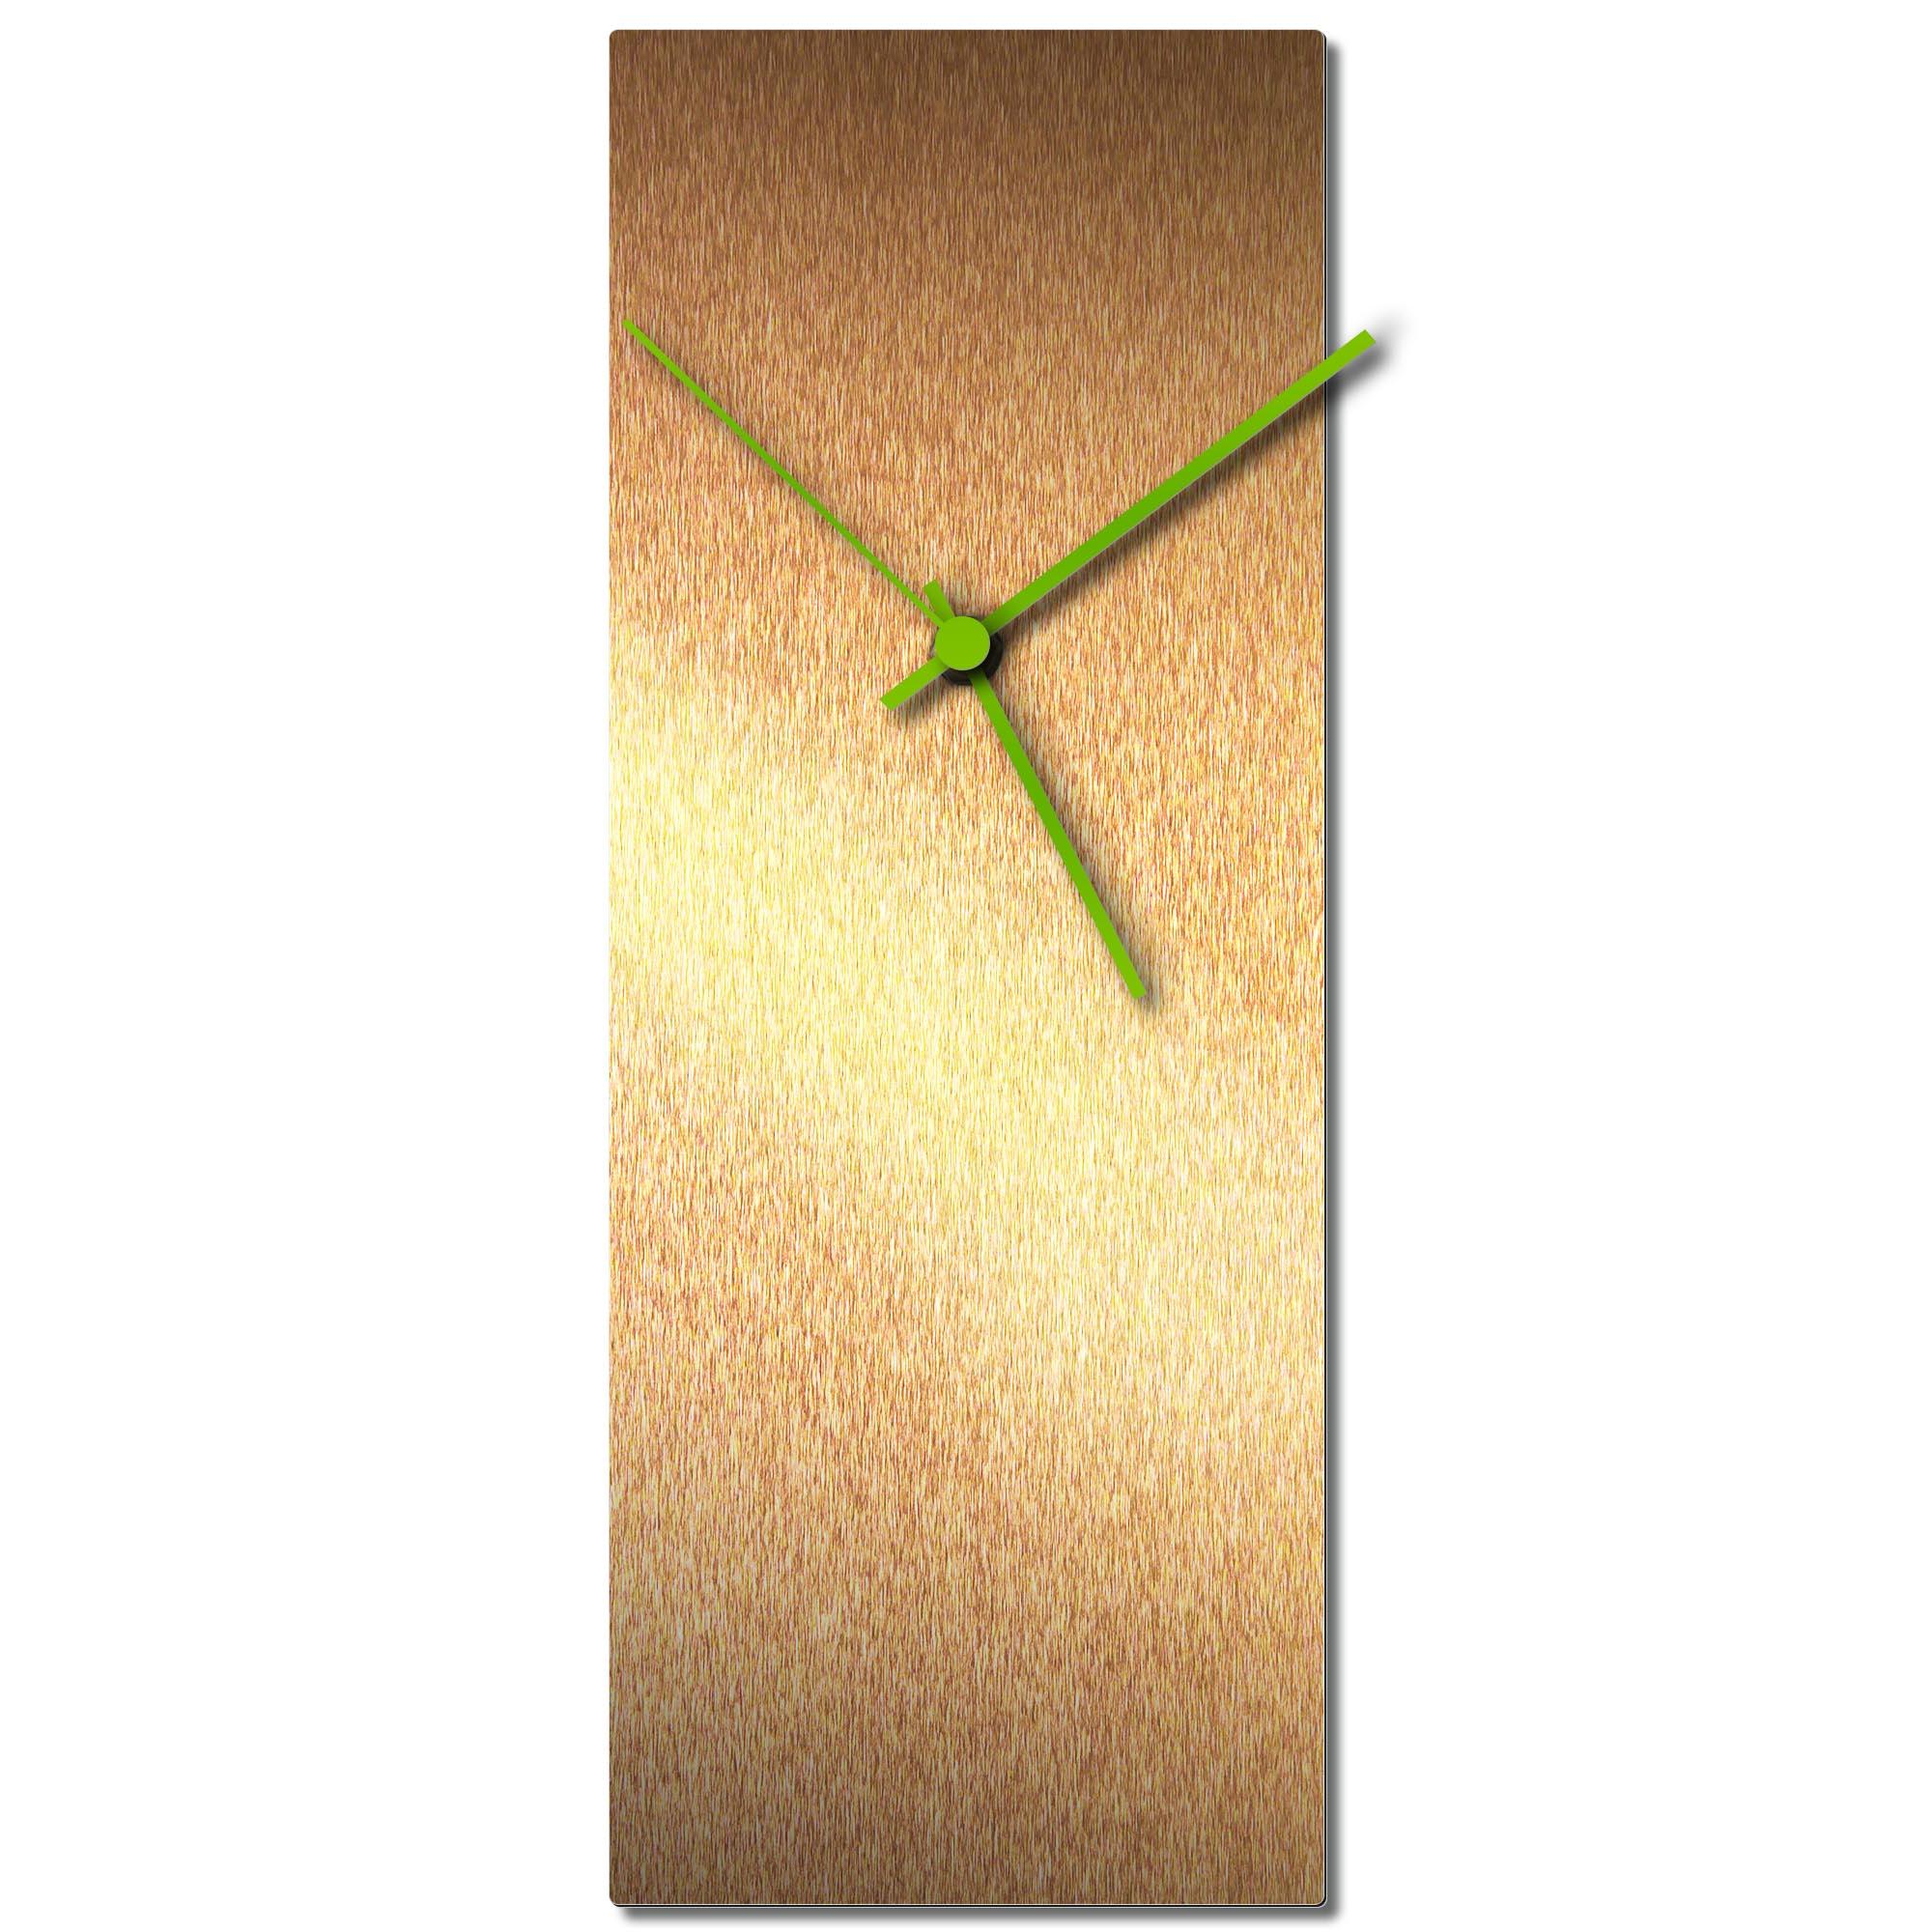 Adam Schwoeppe 'Bronzesmith Clock Large Green' Midcentury Modern Style Wall Clock